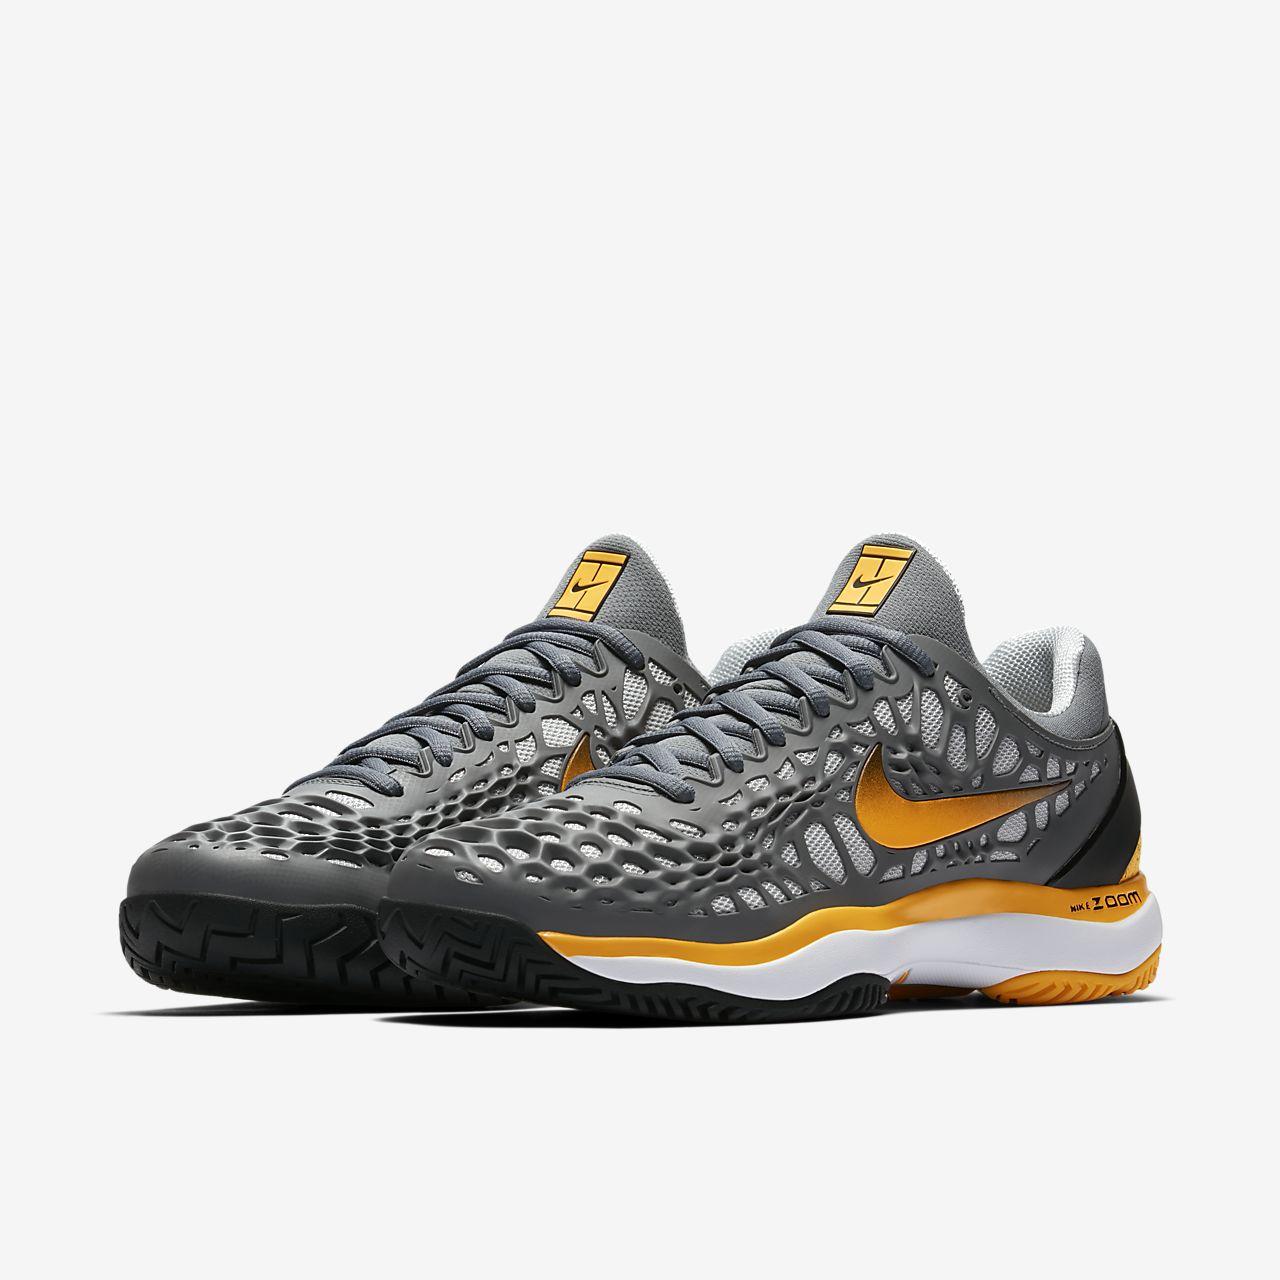 65fa29f44ca ... Nike Zoom Cage 3 HC Men s Tennis Shoe